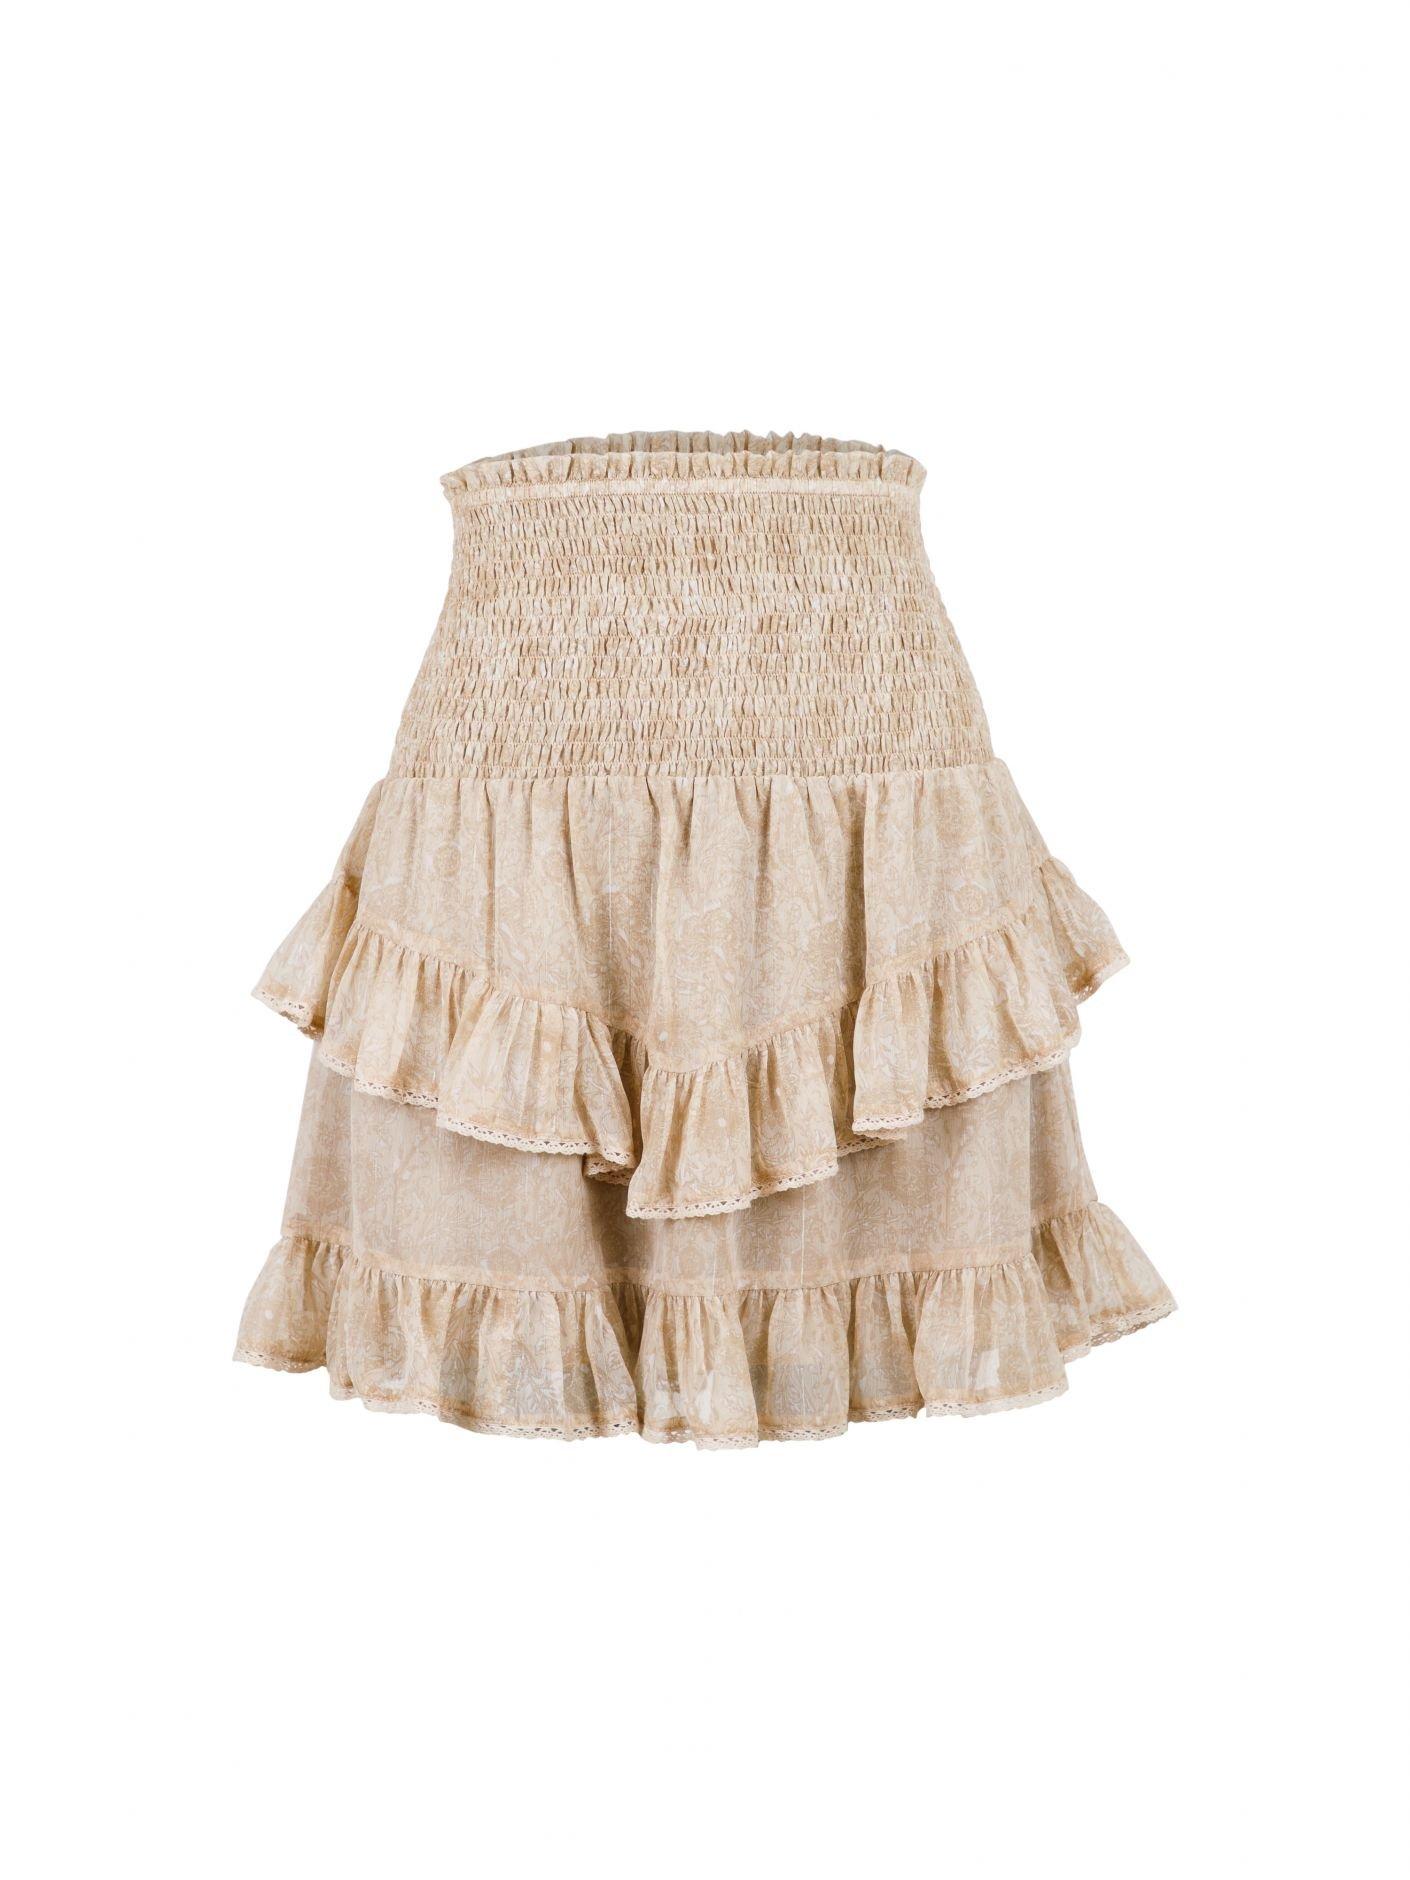 Neo Noir Line Floral Wallpaper  Skirt